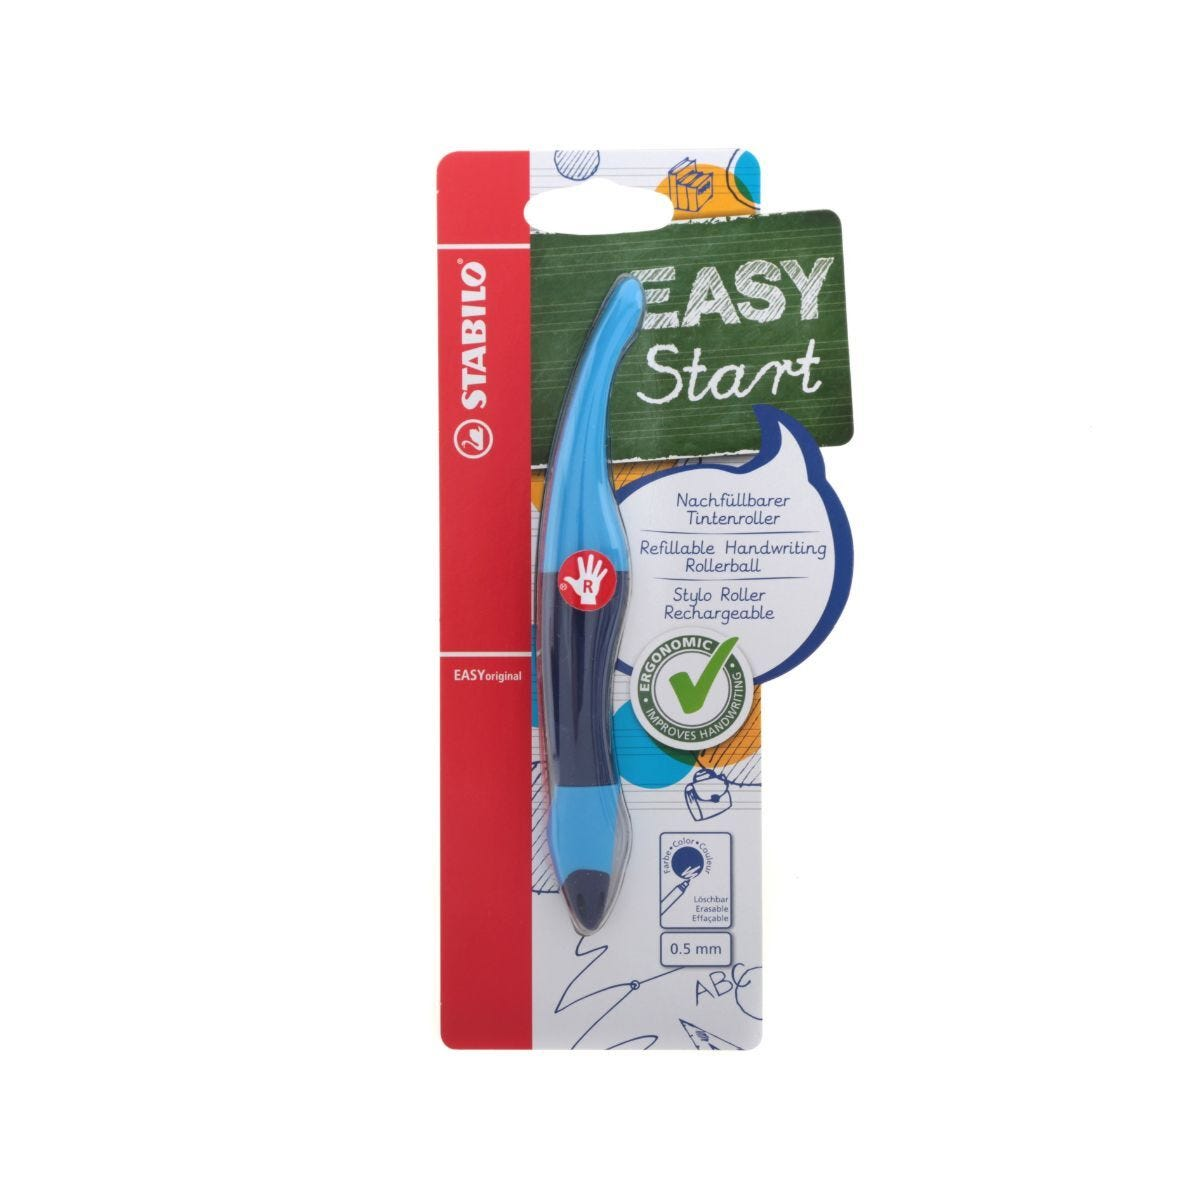 STABILO Easyoriginal Start Right Handed Pen